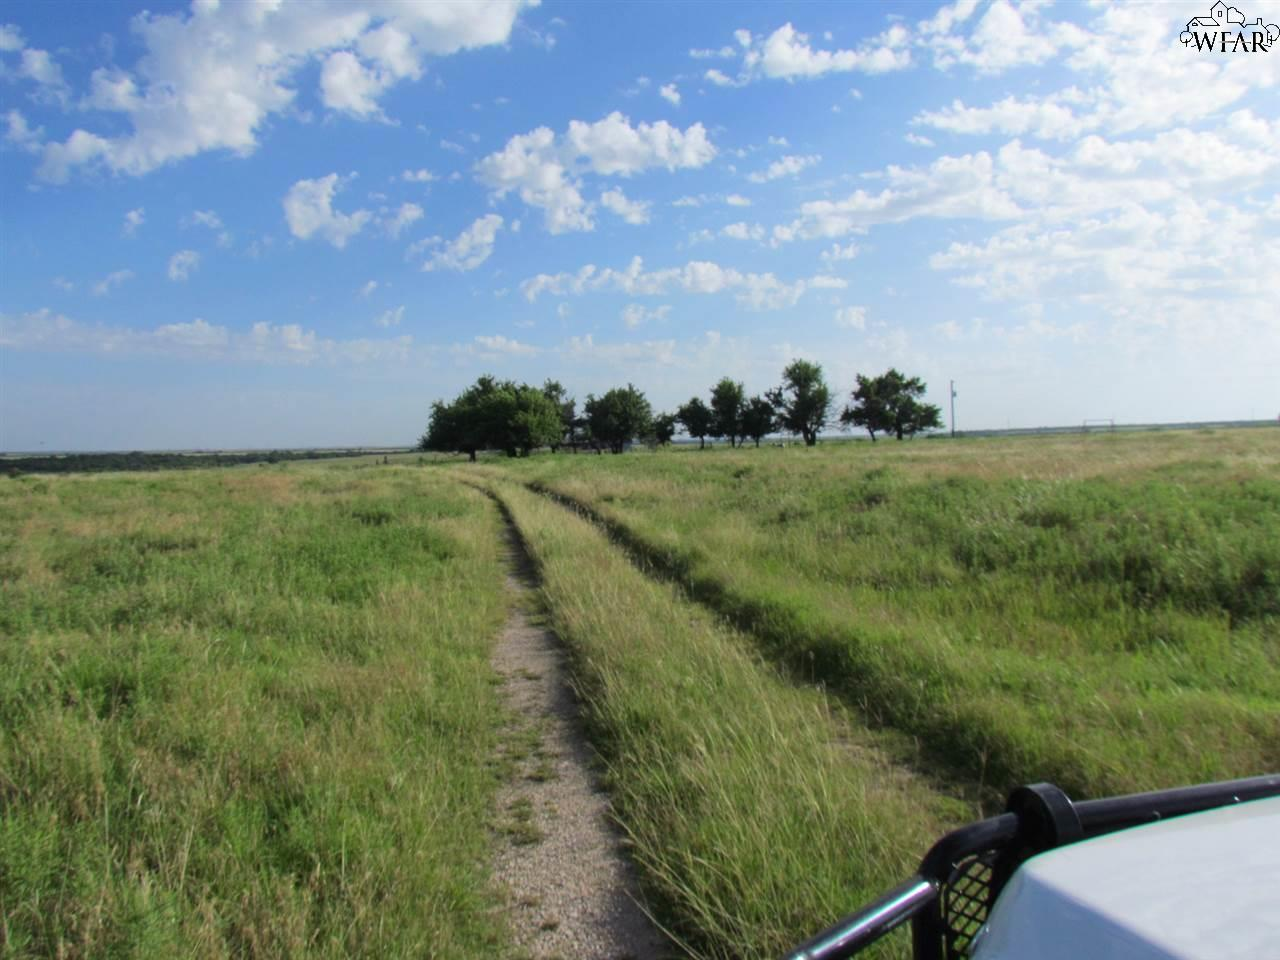 000 OLD CAMBRIDGE ROAD, Henrietta, TX 76365